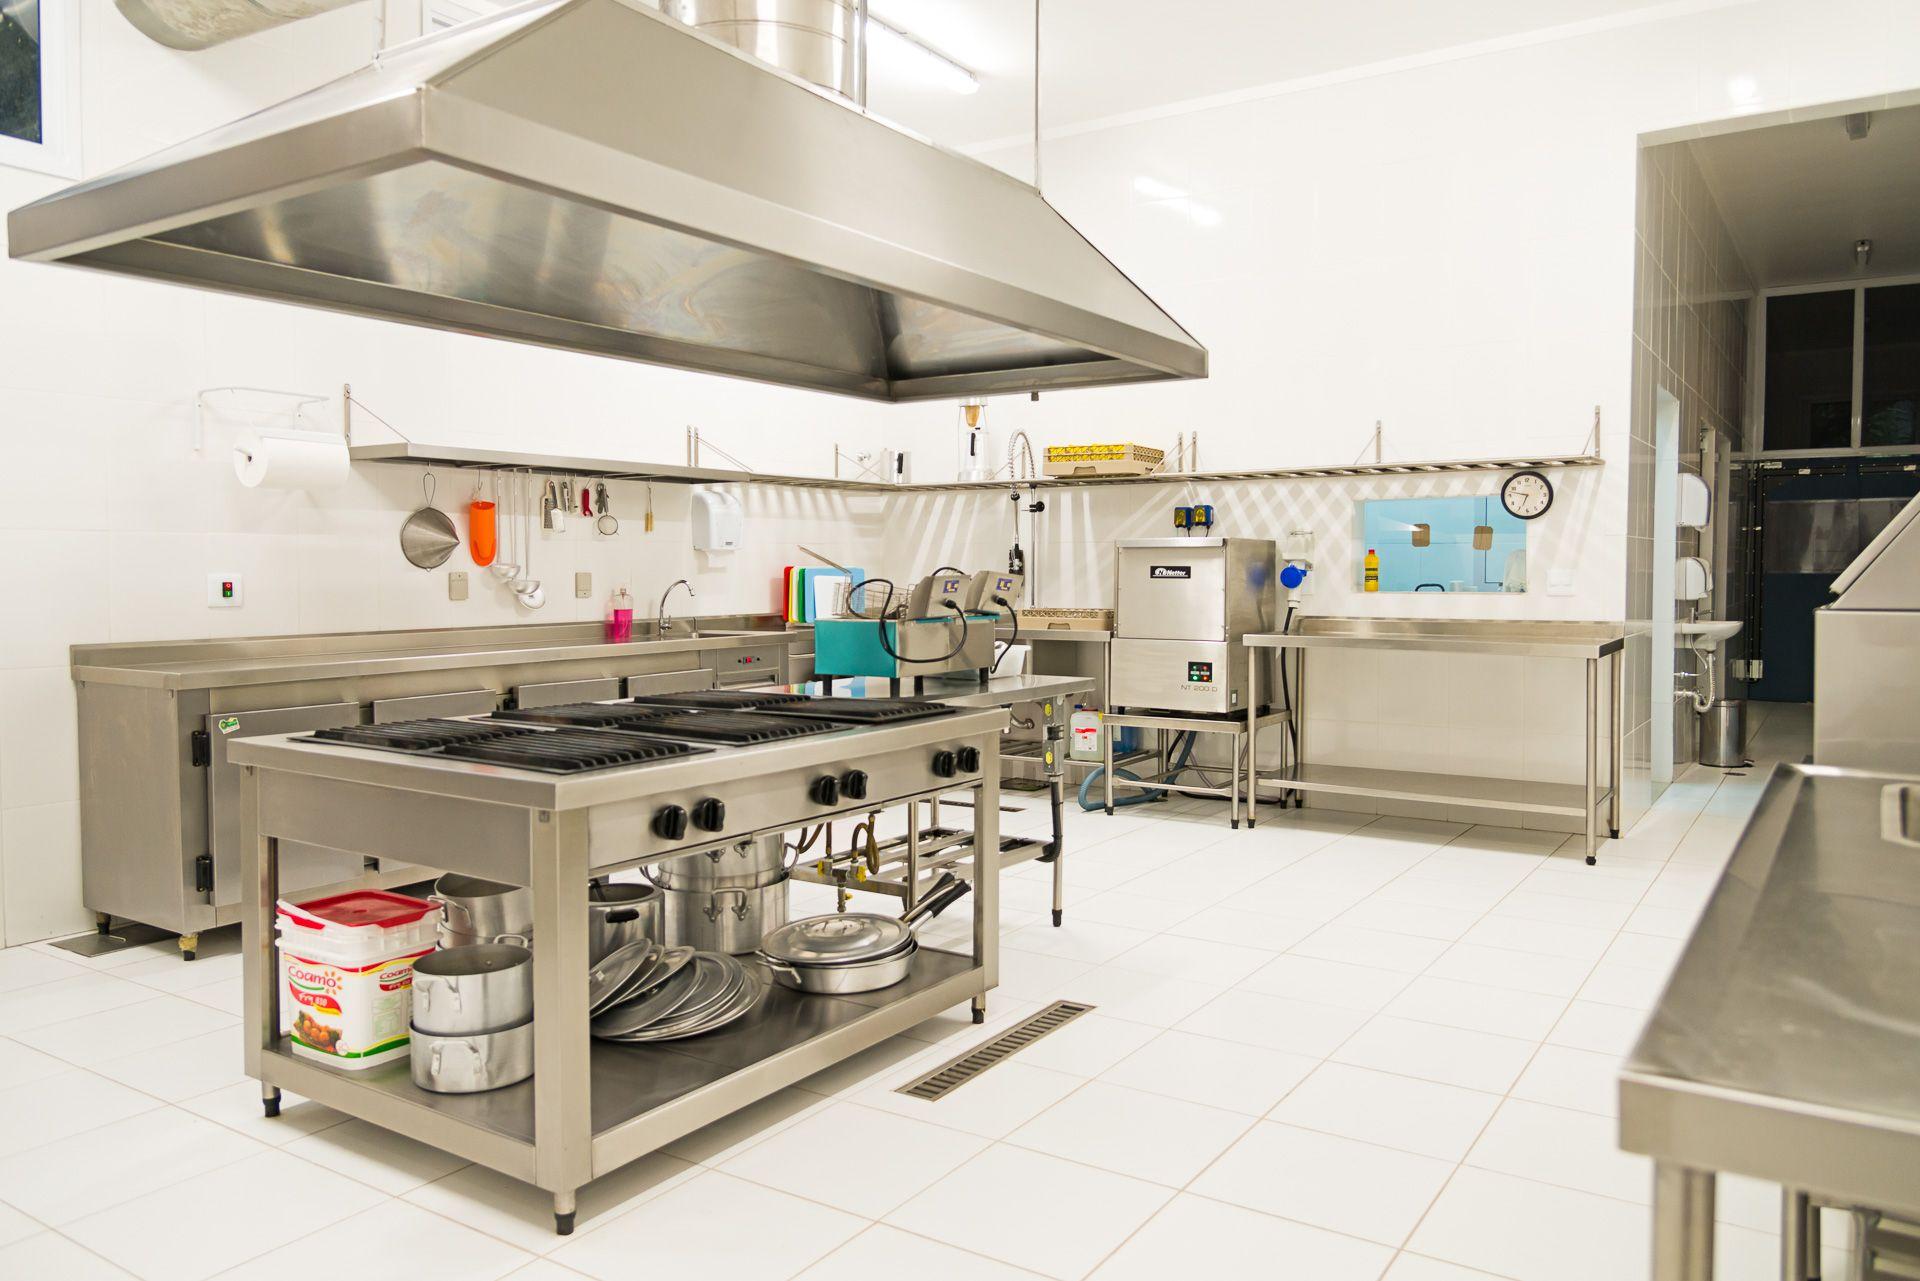 Cozinha Industrial Restaurants Pinterest Cozinhas Industriais